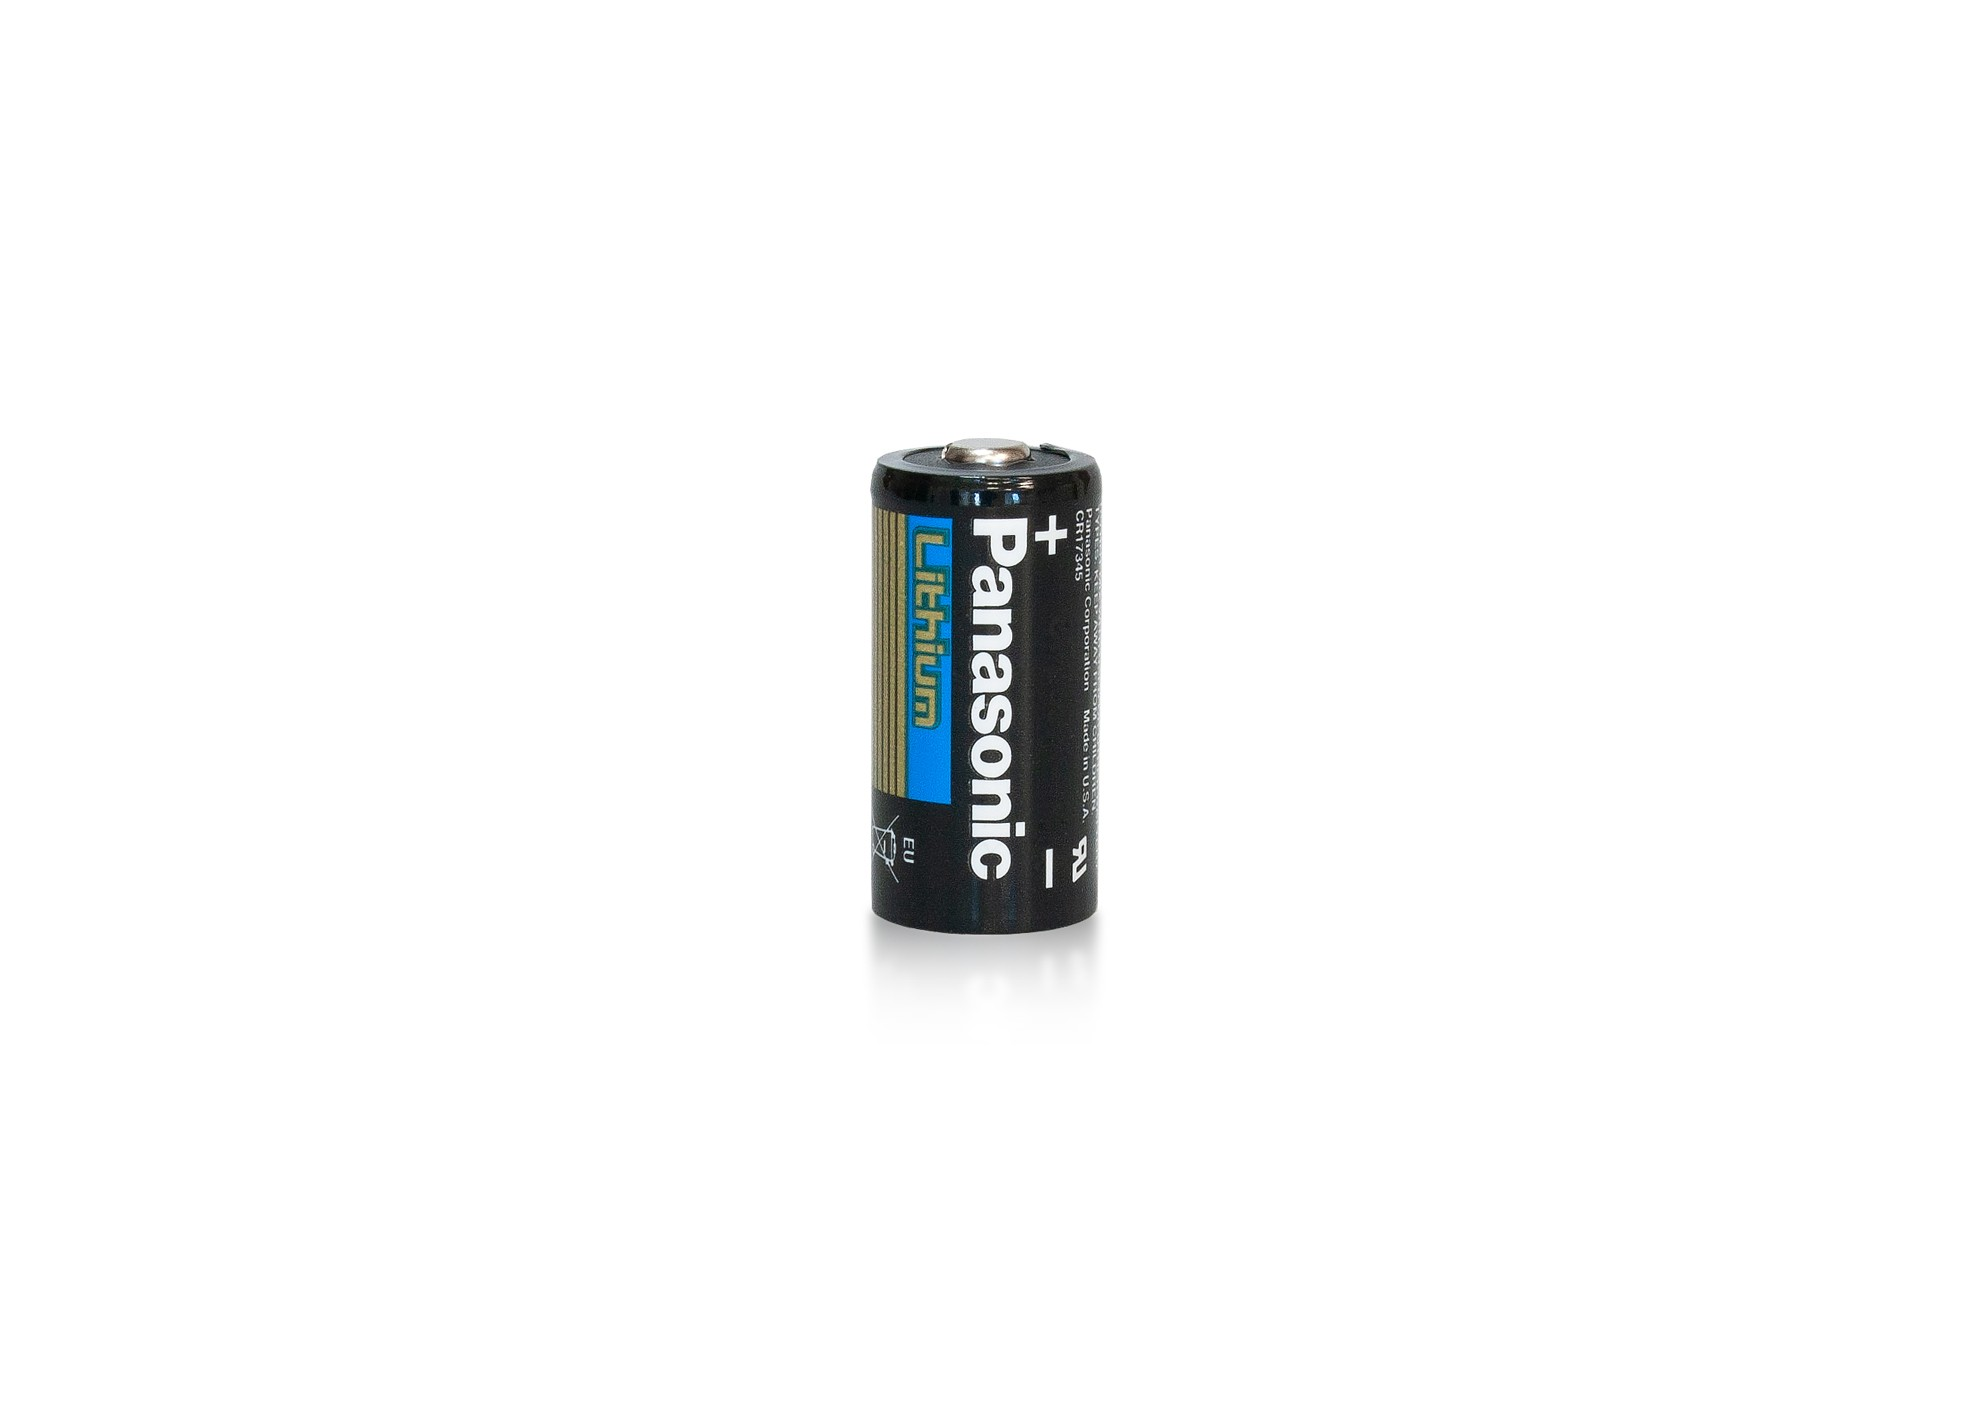 Batéria 3V, 1.4Ah, CR123BN, Panasonic